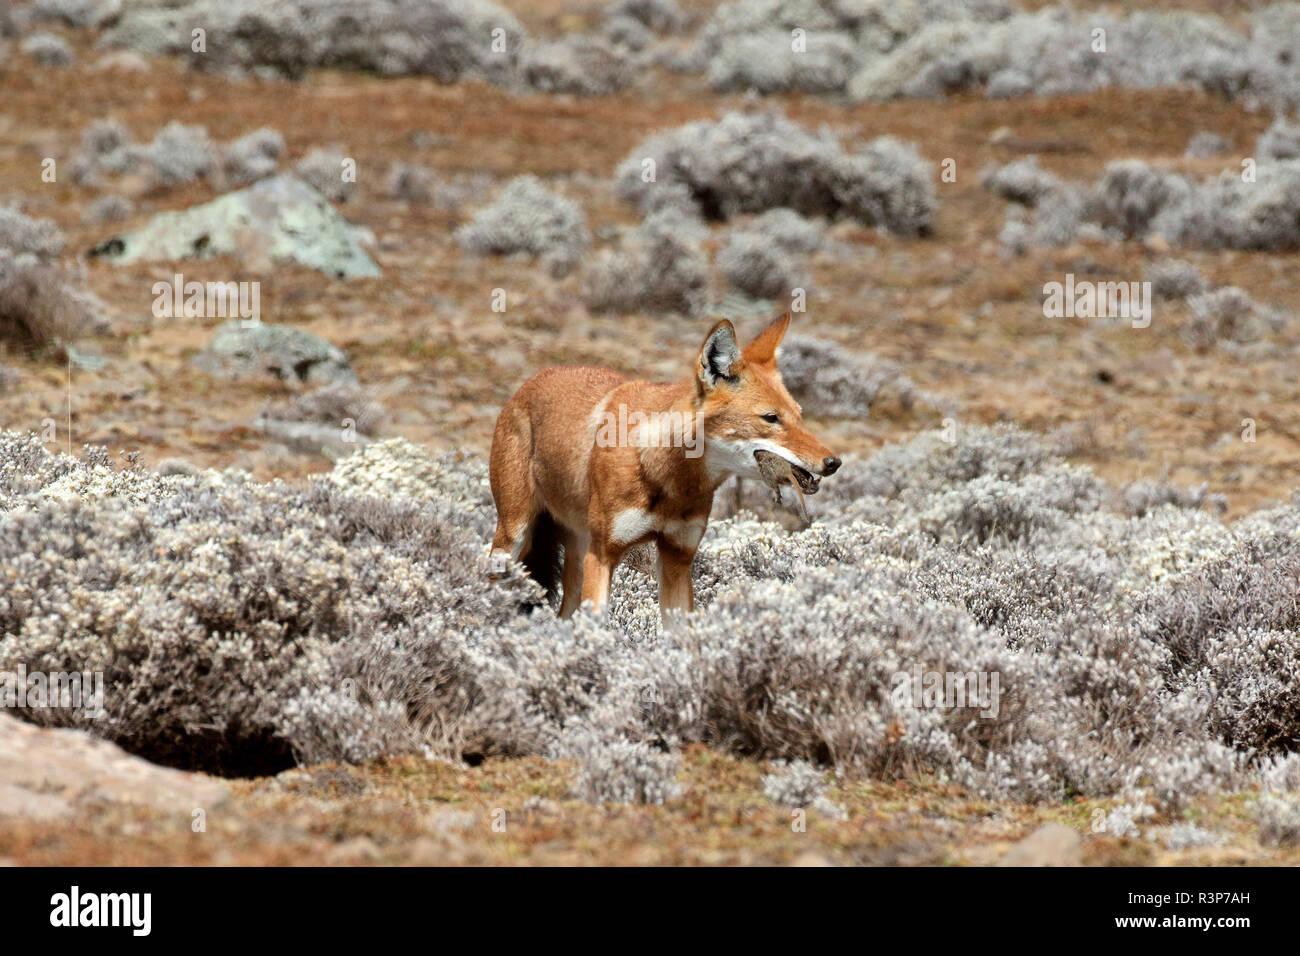 Simian Schakal (Canis simensis) Essen eine Mole Ratte unter Kap Gold, Bale Berge, Äthiopien Stockbild